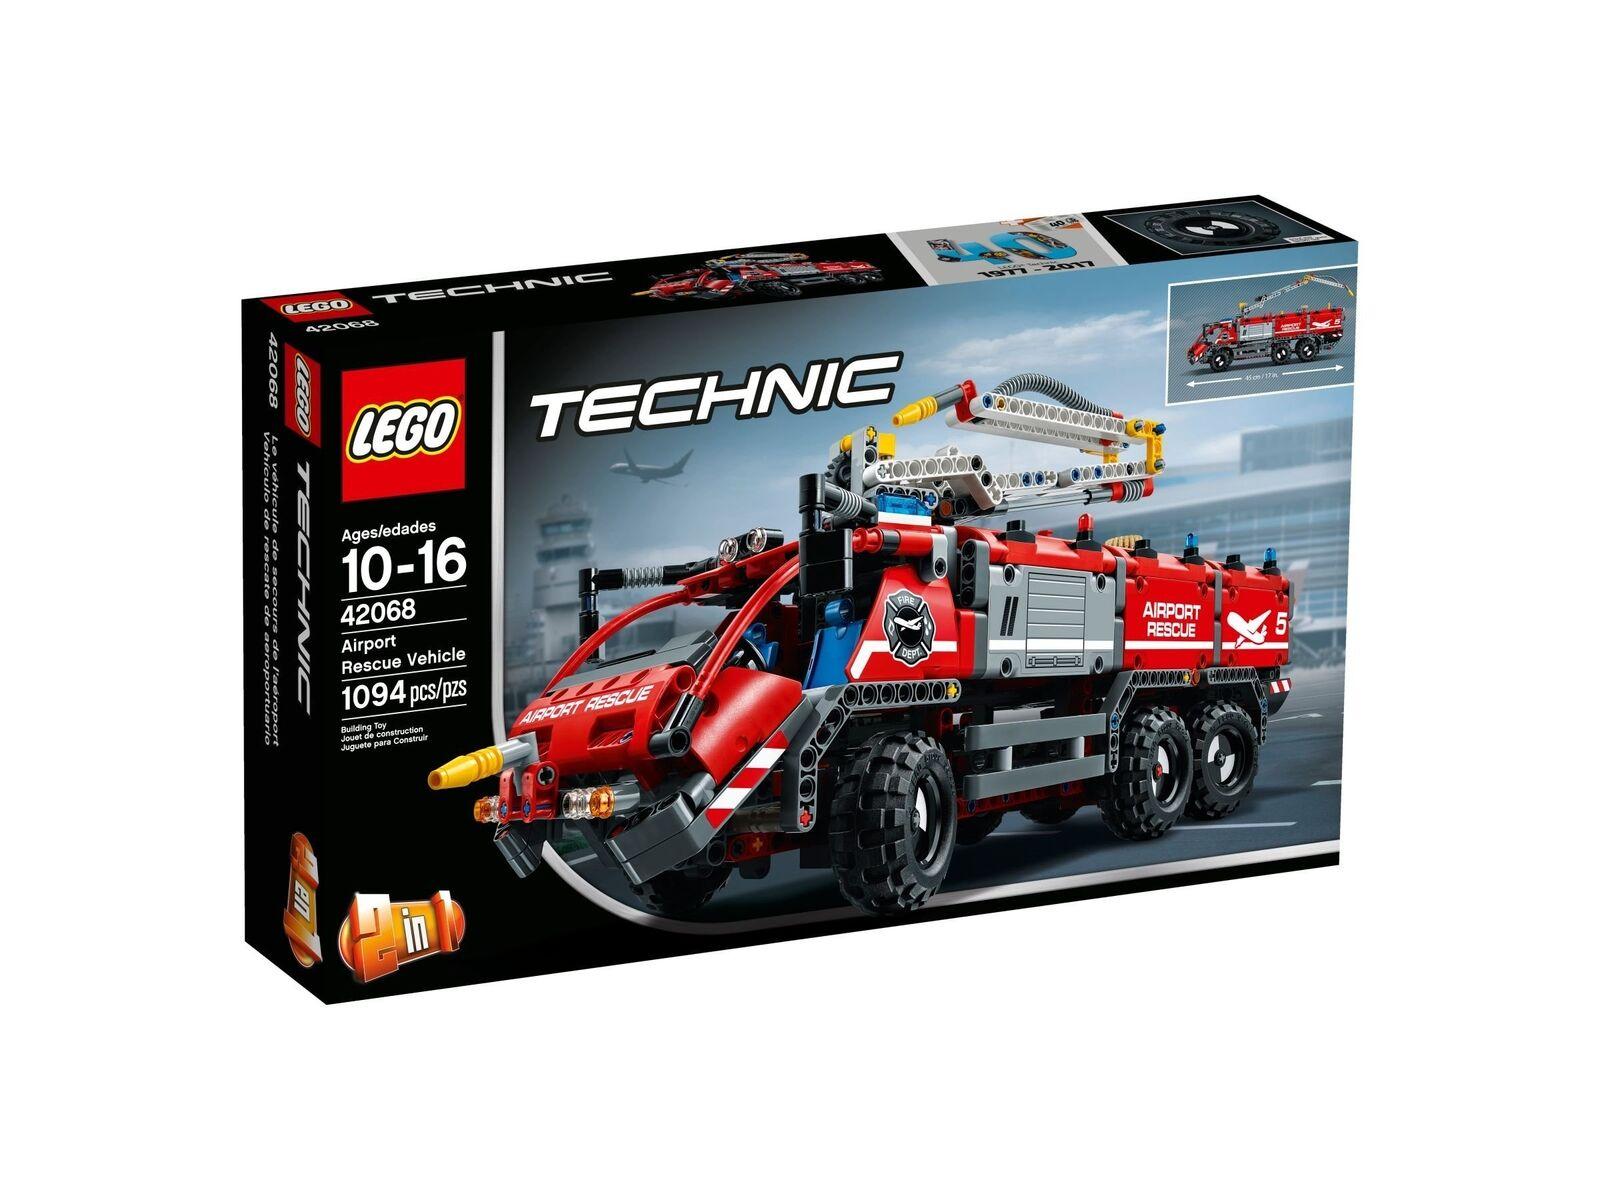 Técnica Lego ™ 42068 Cargas Pesadas Nuevo Embalaje Original Misb